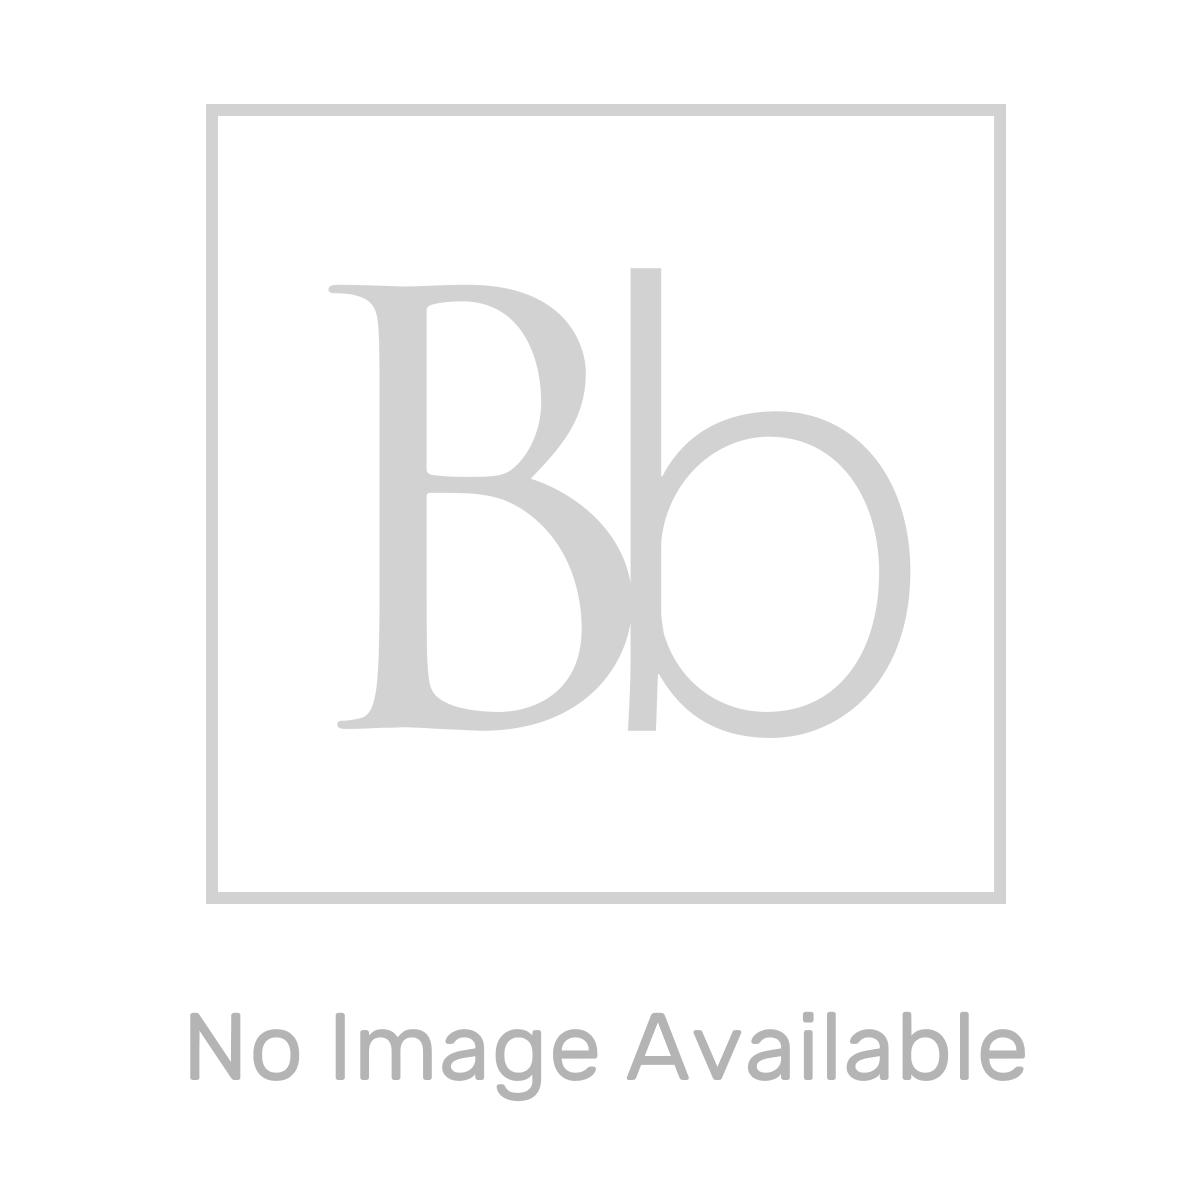 RAK Precious Behind Grey Wall Hung Counter Basin 1000mm with Brackets Measurements